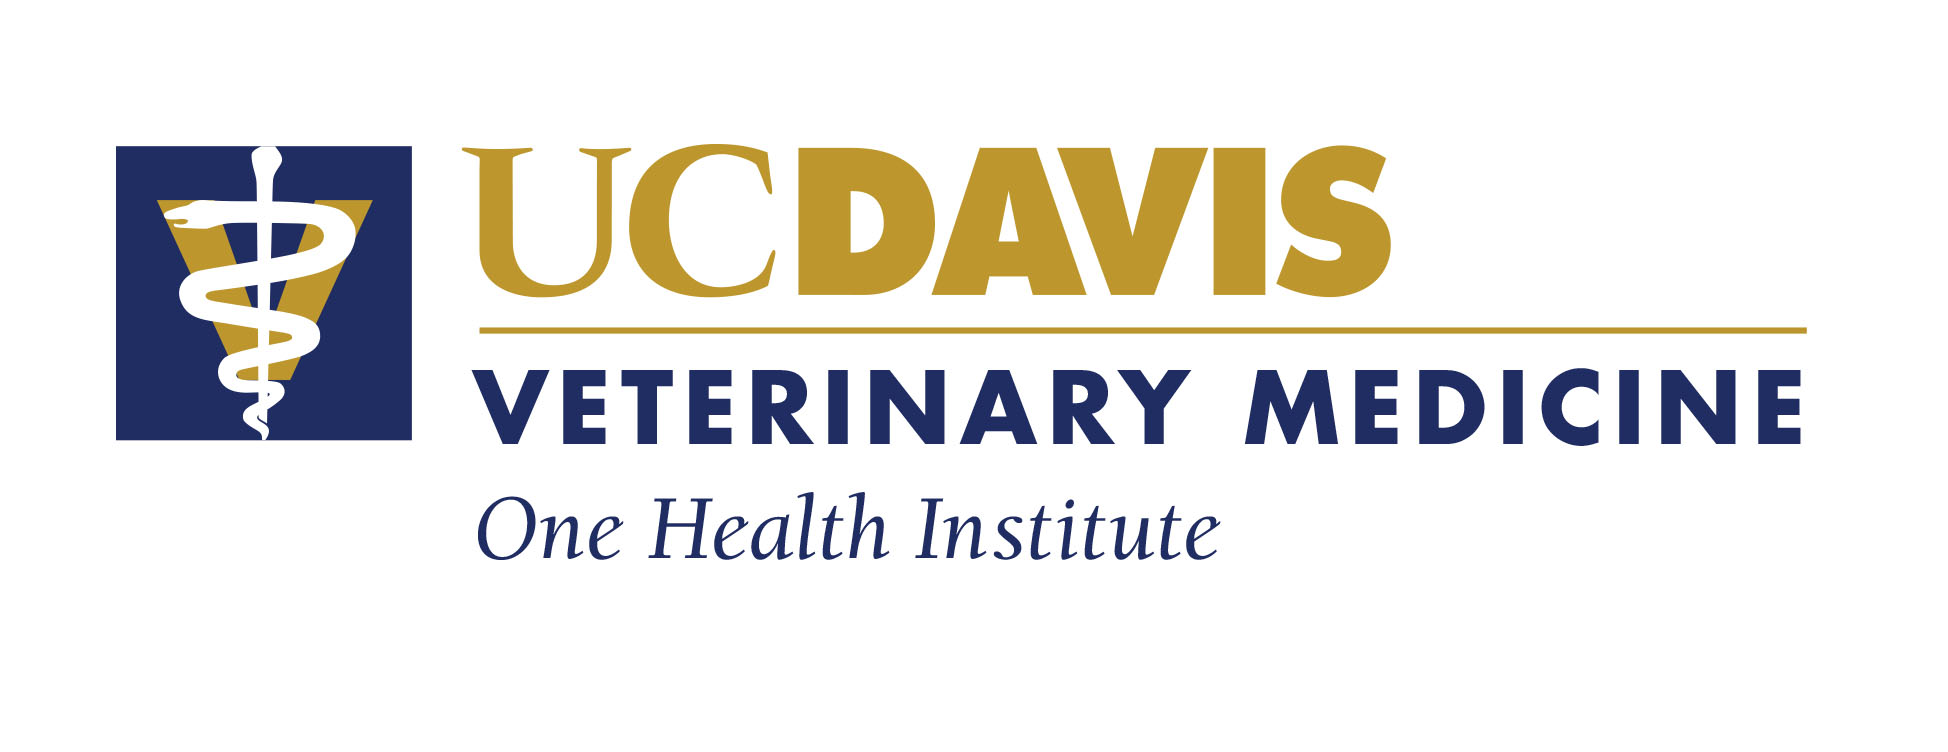 UC Davis One Health Institute